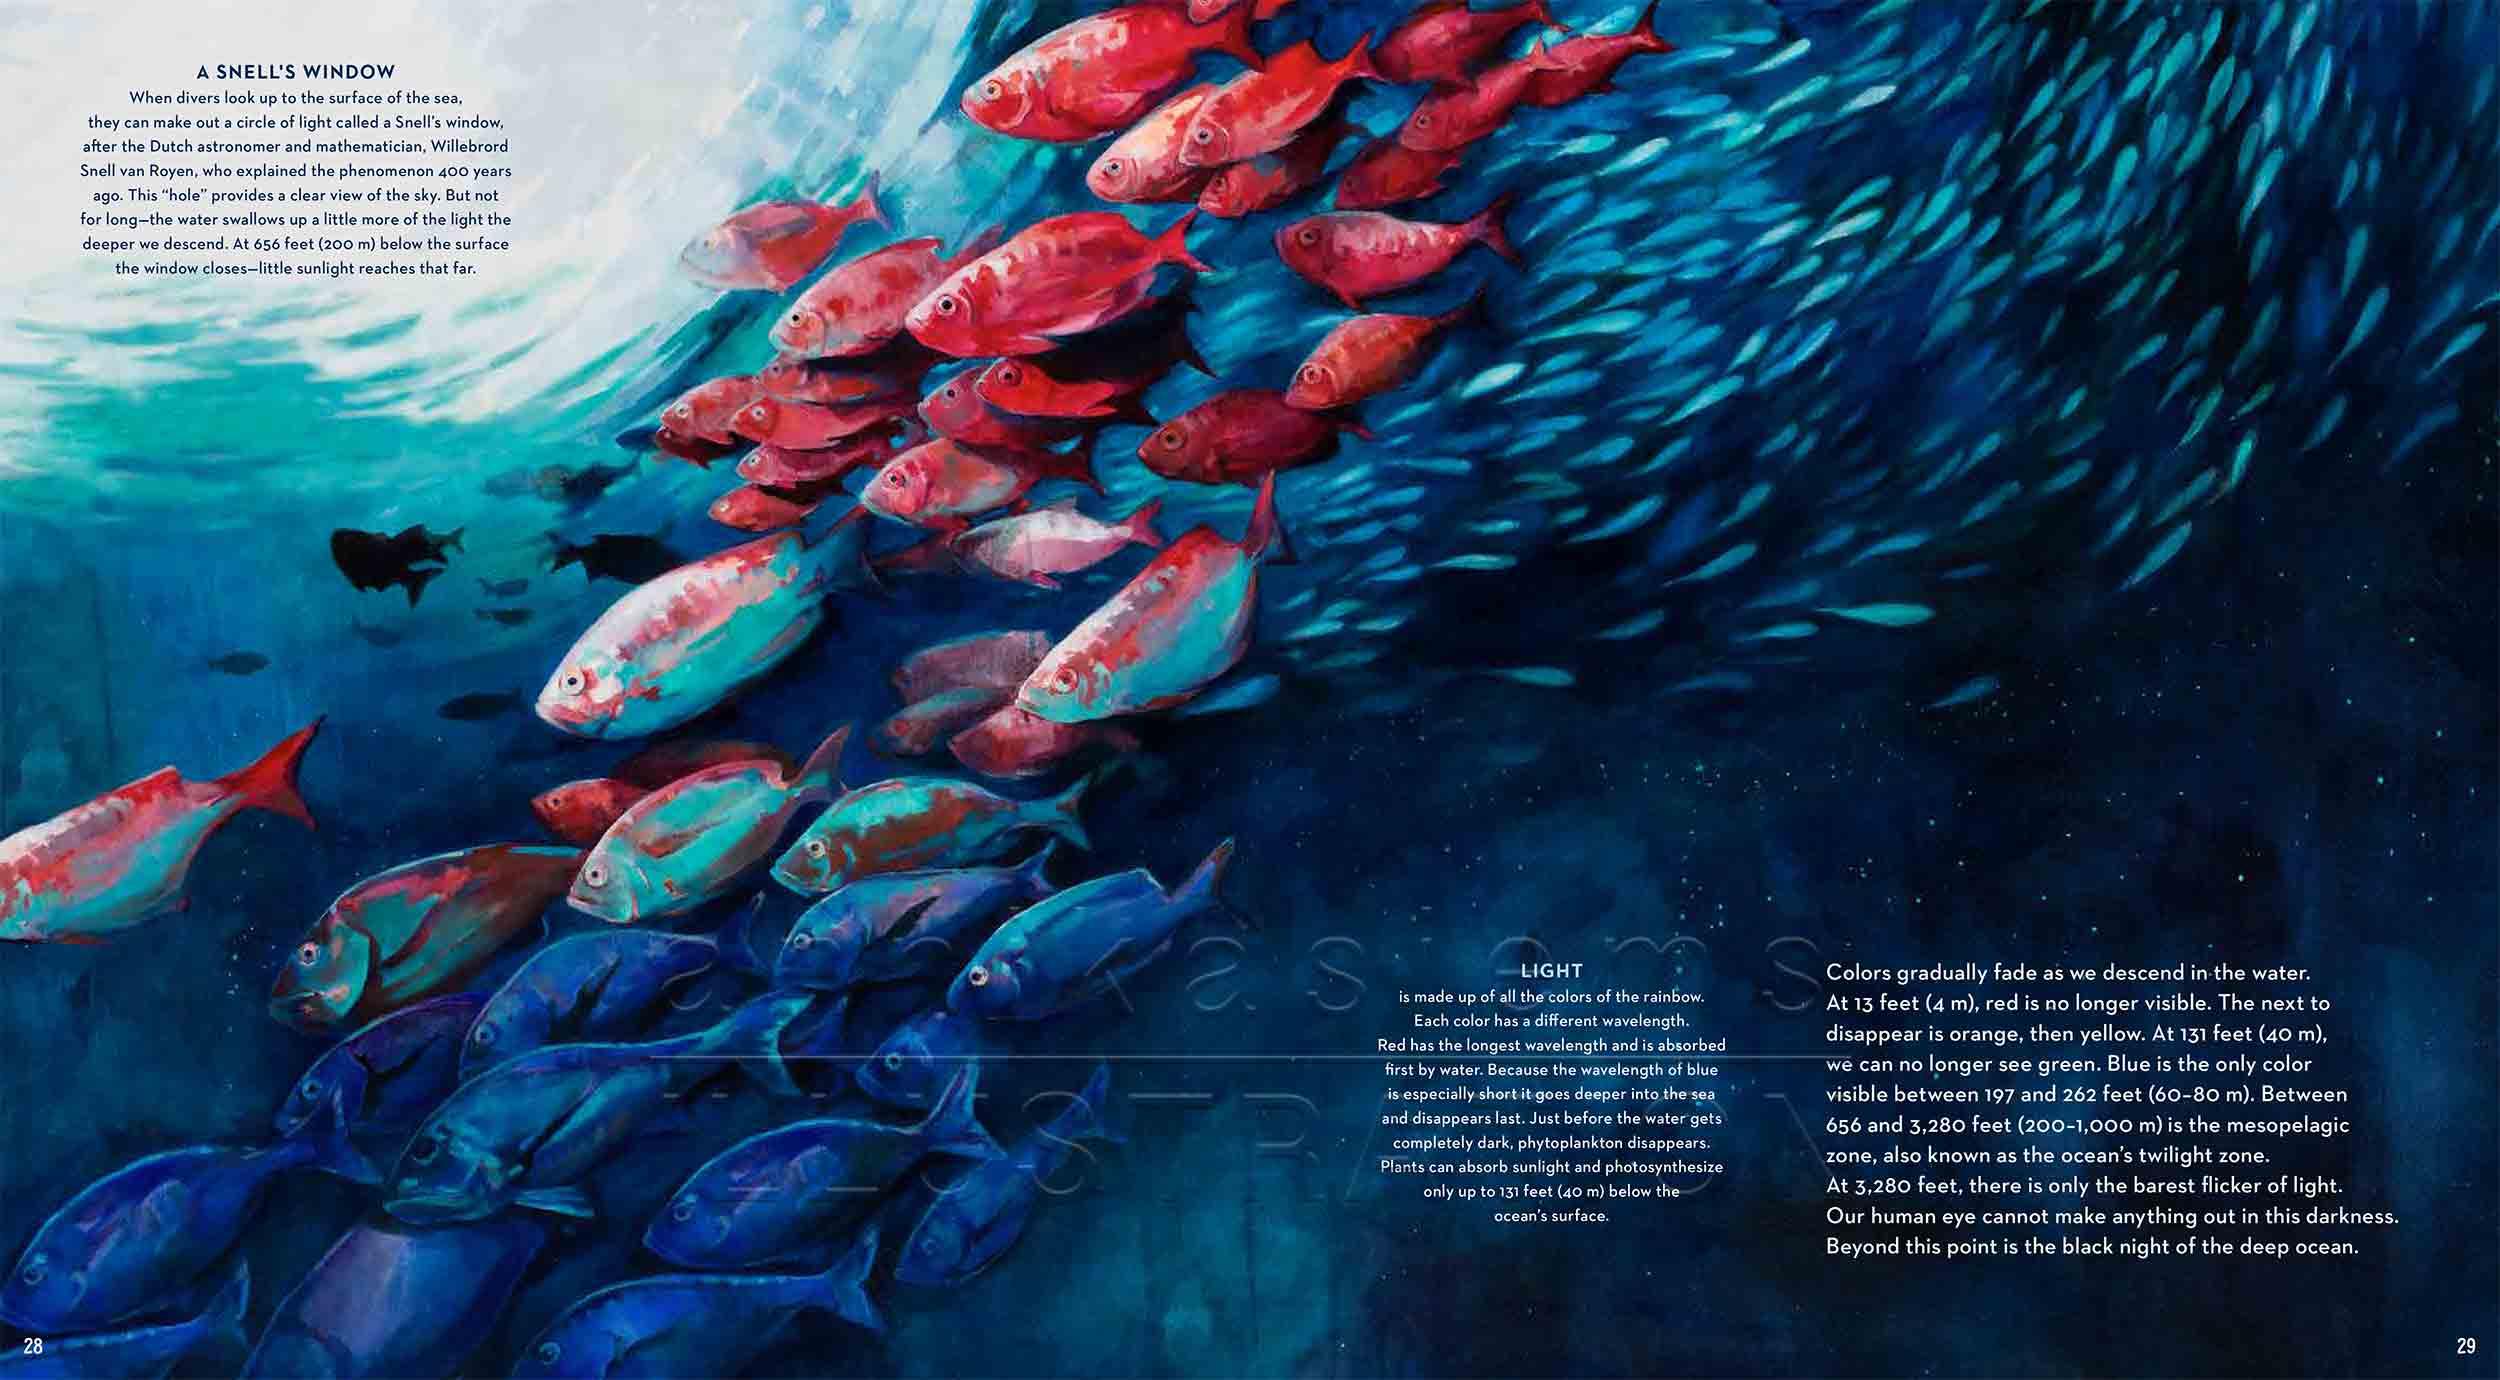 28-29-farbreduktion-fish-deep-sea-Englisch-submersible-©annikasiems-plankton_deepsea-zooplankton.jpg